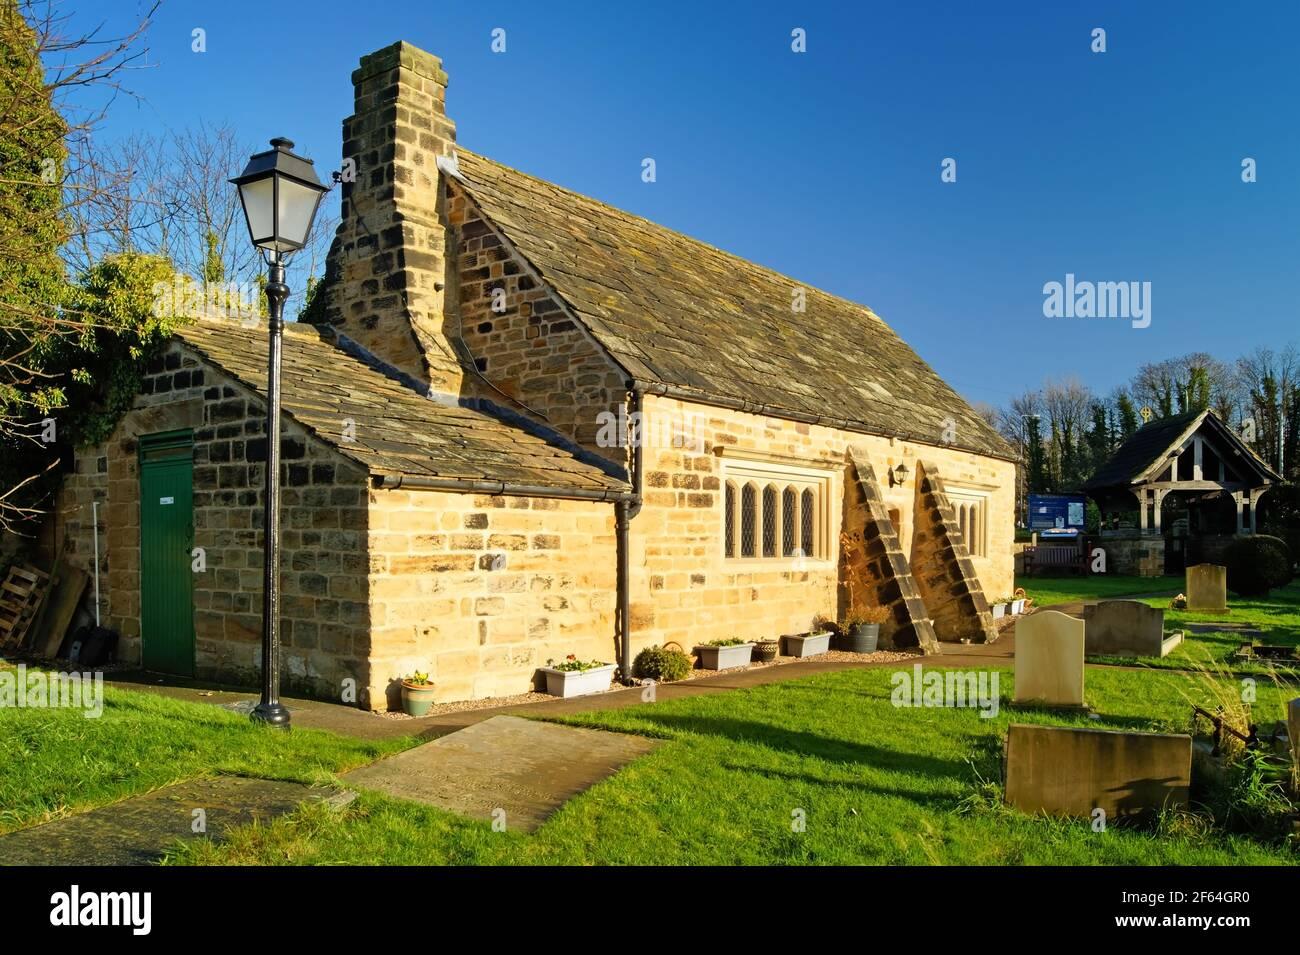 Reino Unido, West Yorkshire, Wakefield, Felkirk, Iglesia de San Pedro, Sala de la vieja escuela Foto de stock